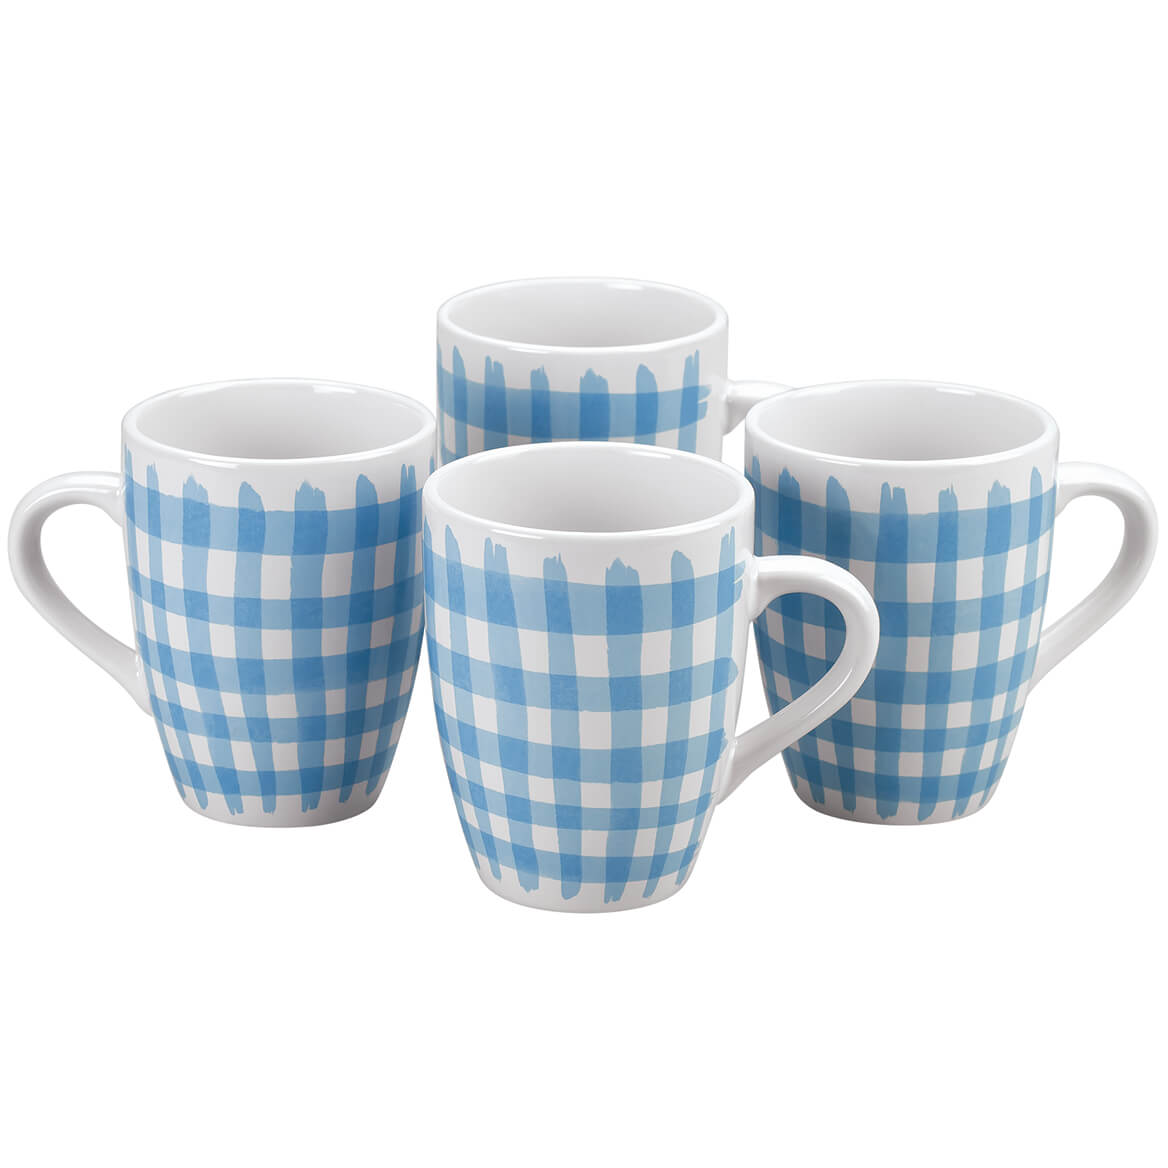 Blue Shirt Mugs by William Roberts, Set of 4-369198